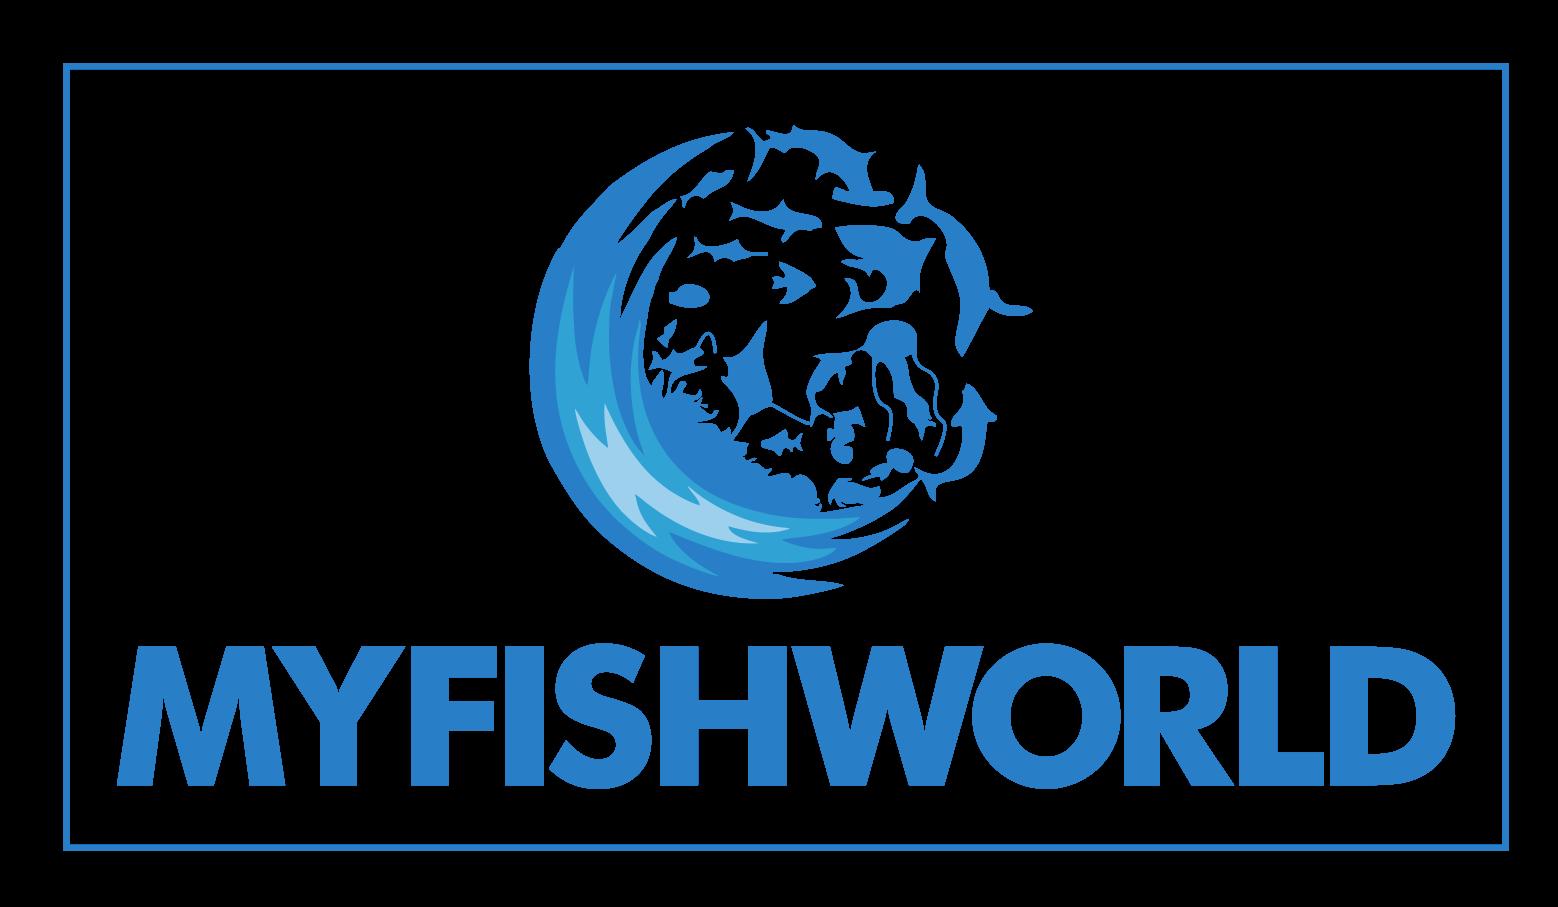 MYFISHWORLD